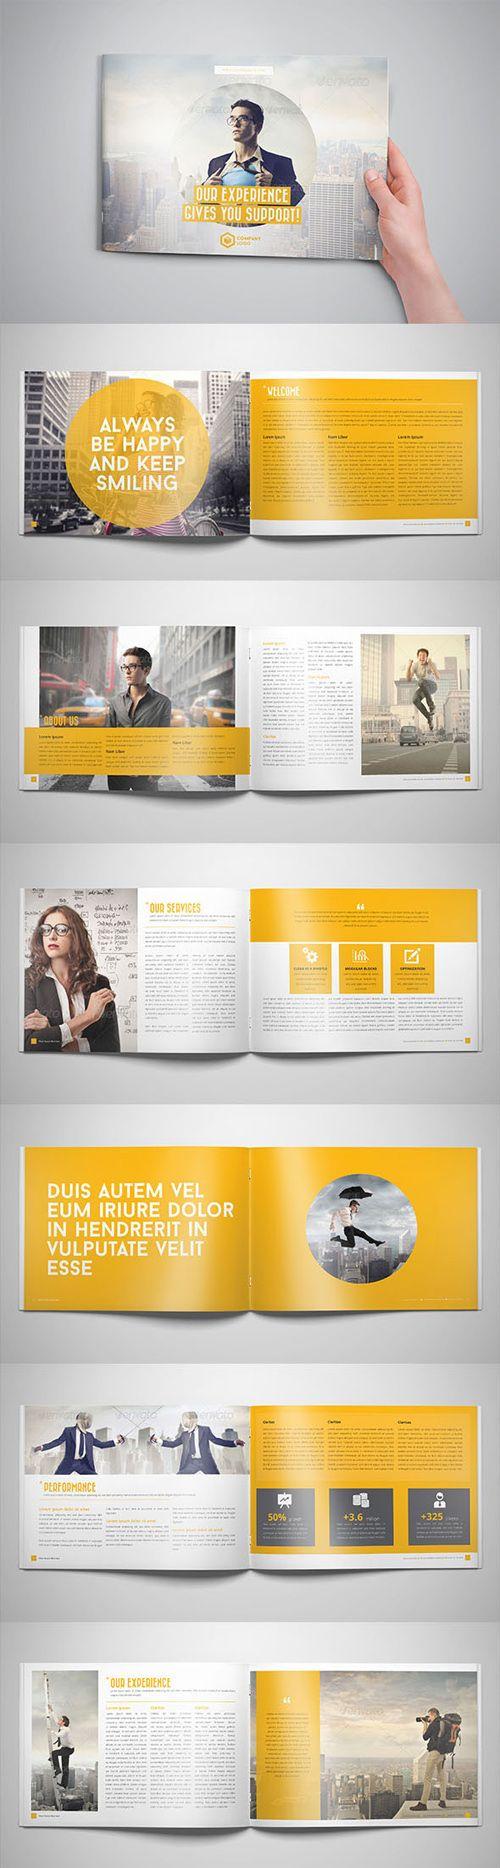 Business Horizontal Brochure Good Example Of Crap Booklet - Horizontal brochure template